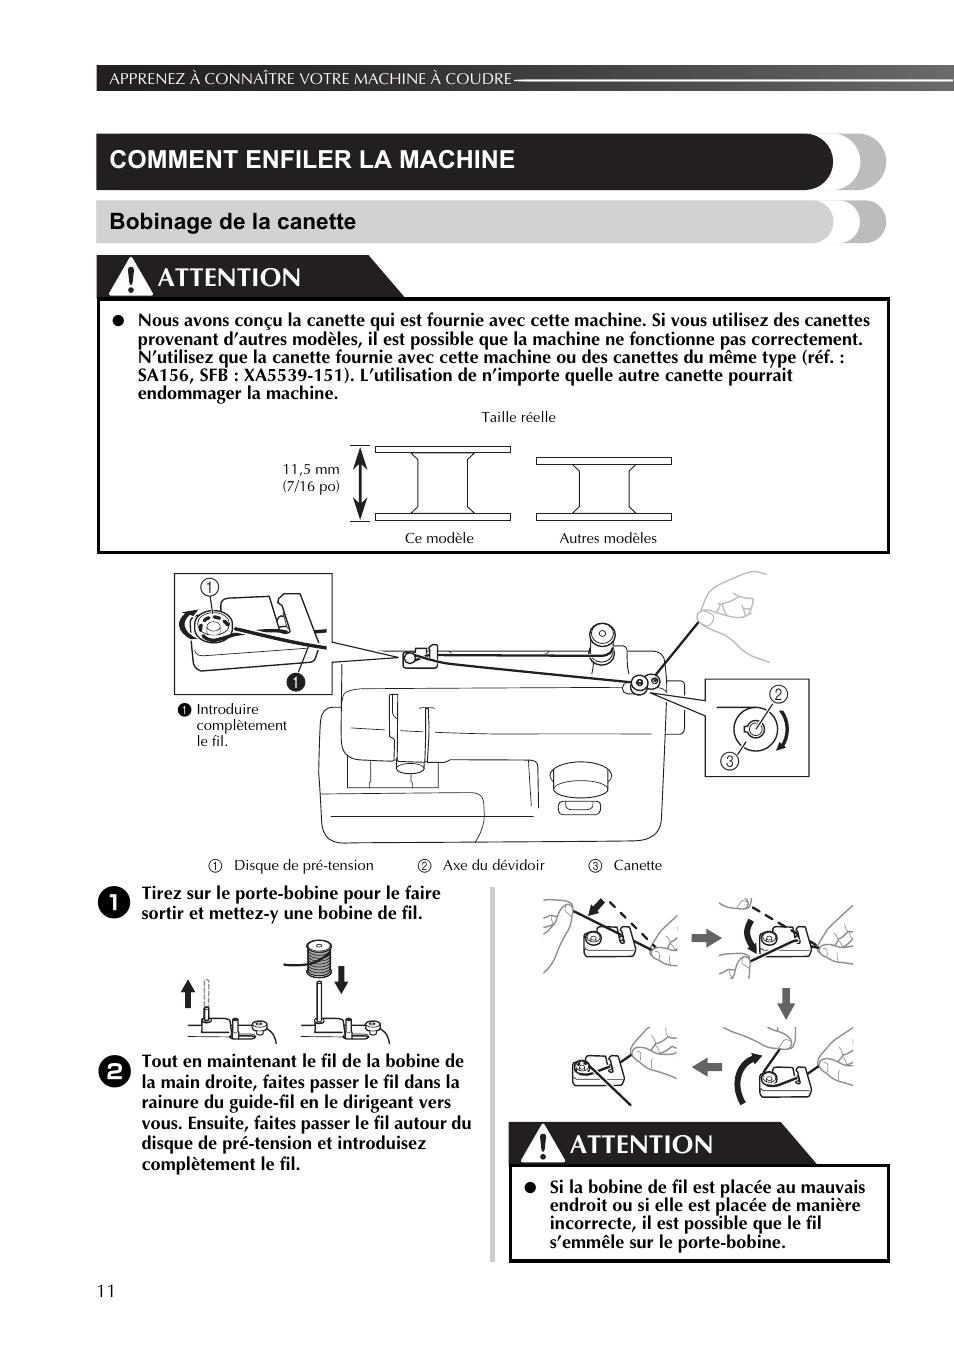 comment enfiler la machine bobinage de la canette attention brother j14 manuel d 39 utilisation. Black Bedroom Furniture Sets. Home Design Ideas